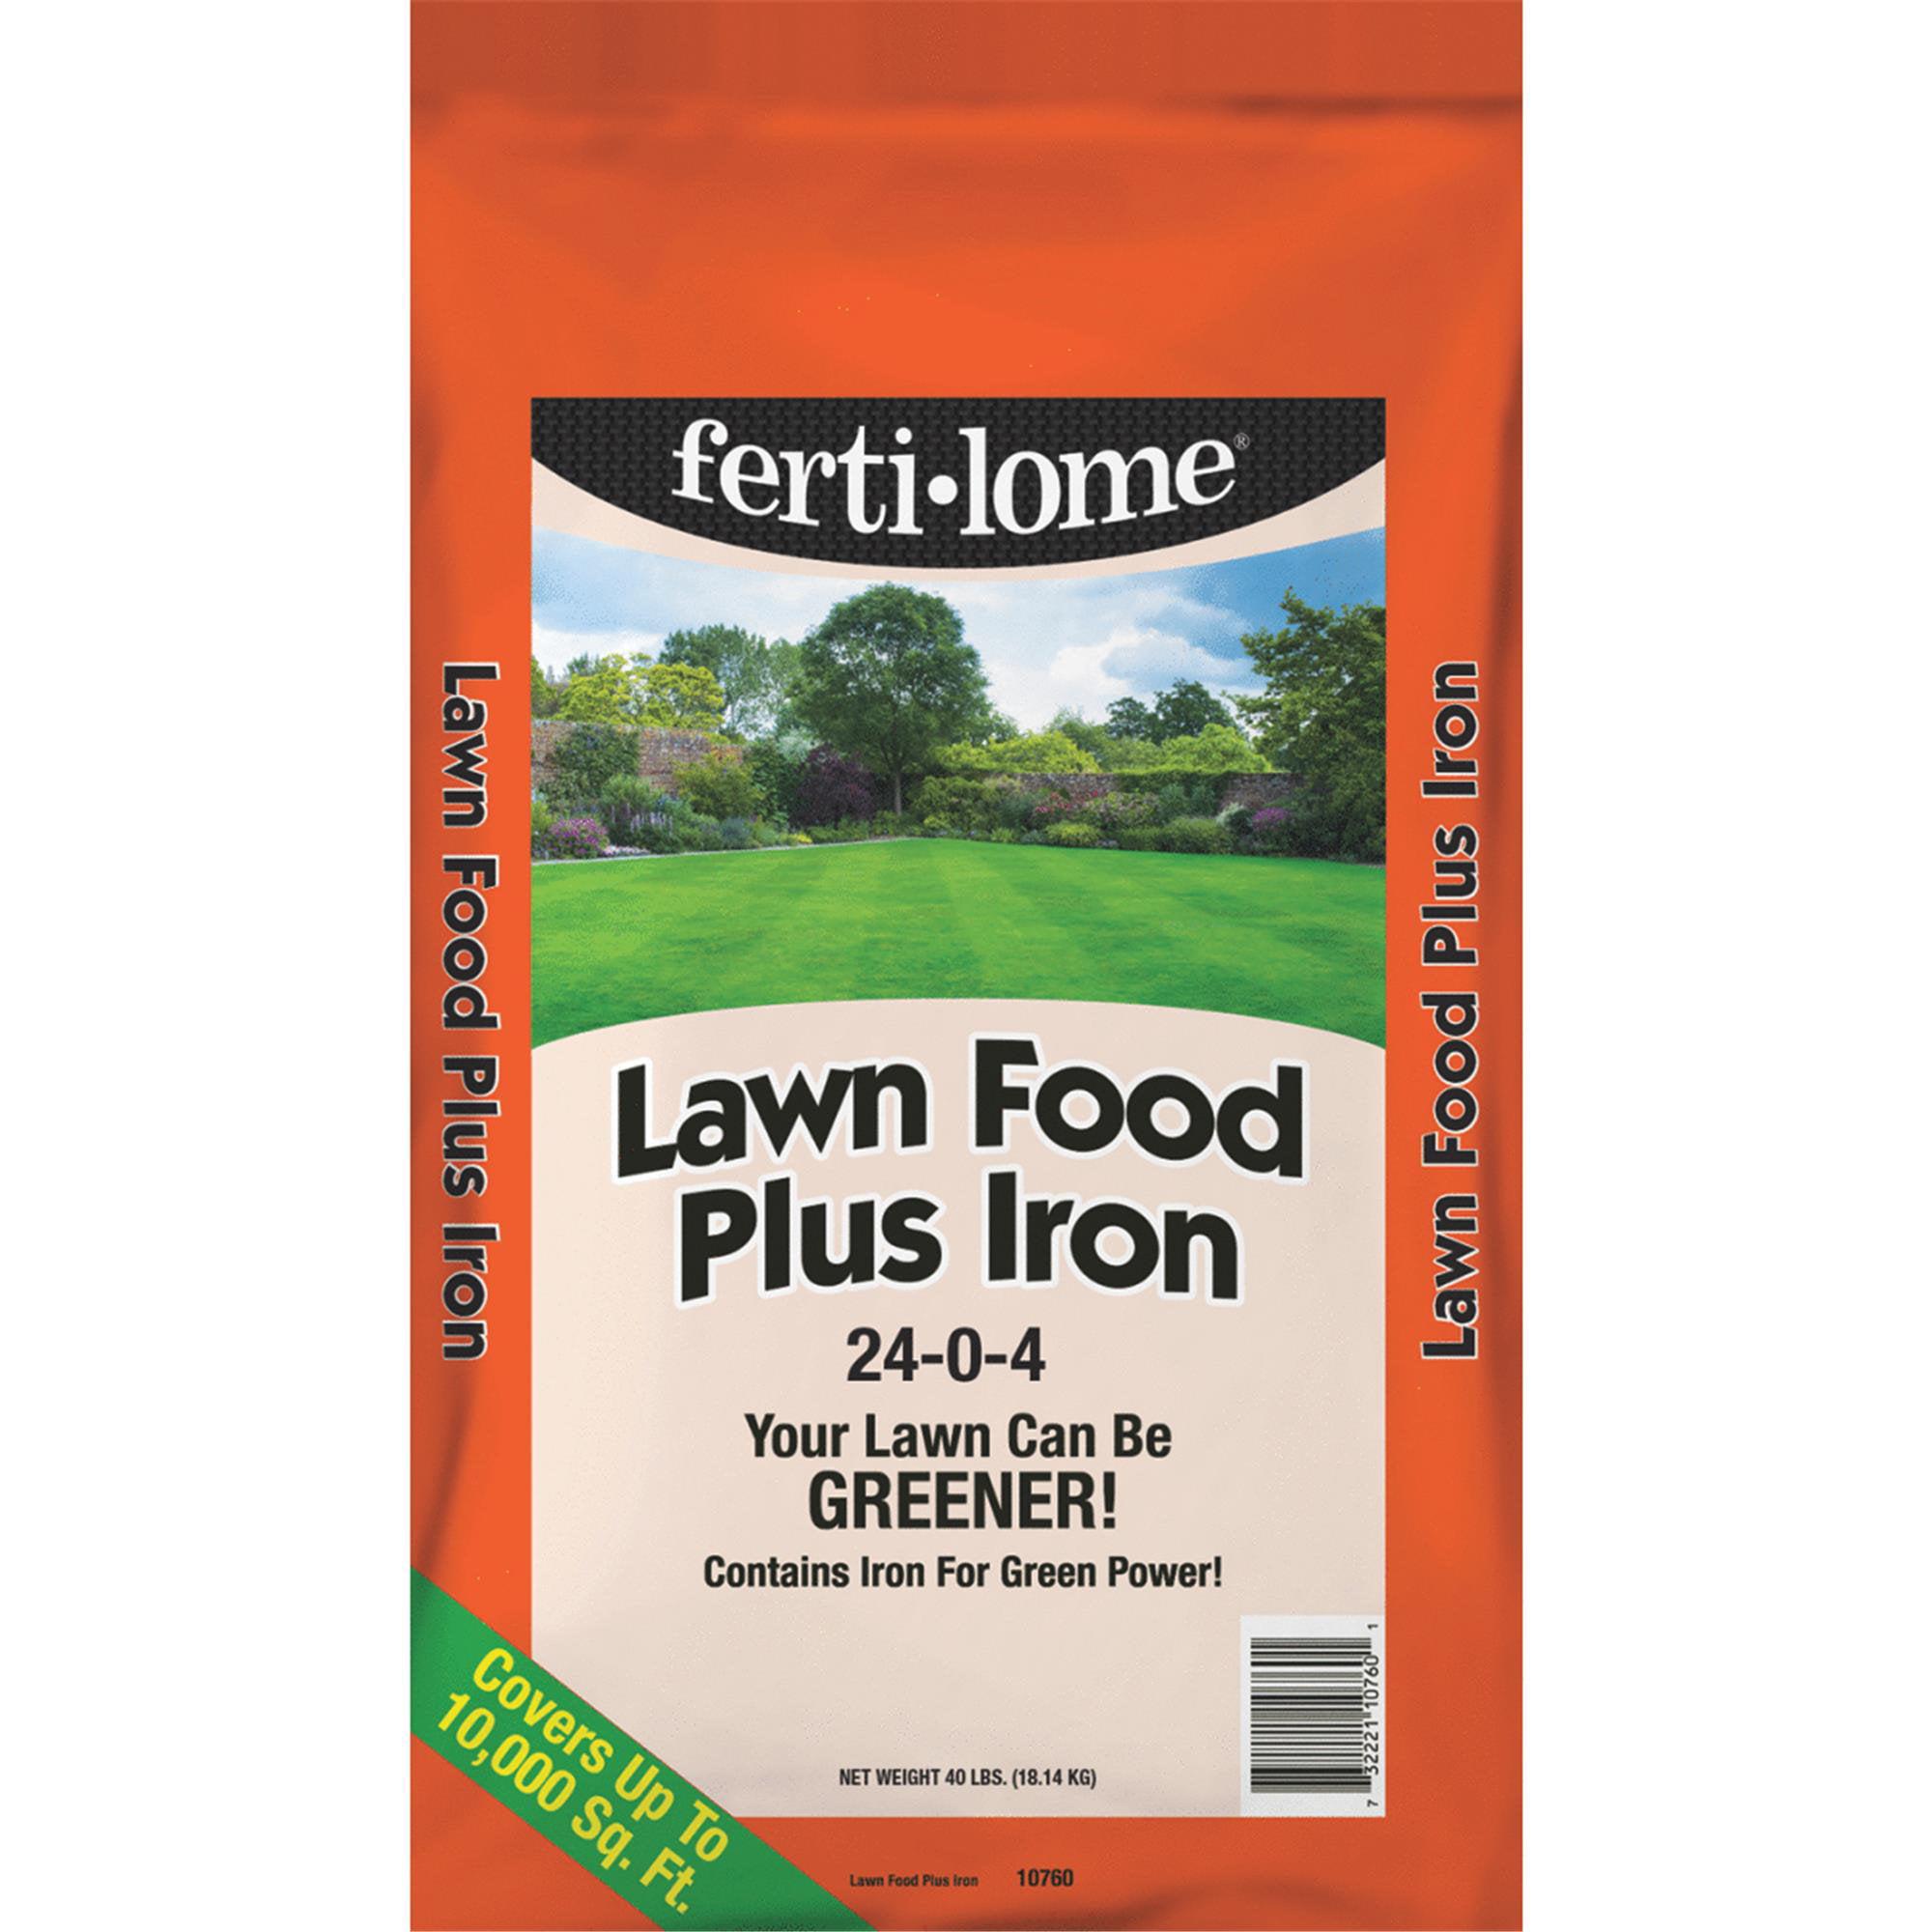 Ferti-lome Lawn Fertilizer Plus Iron